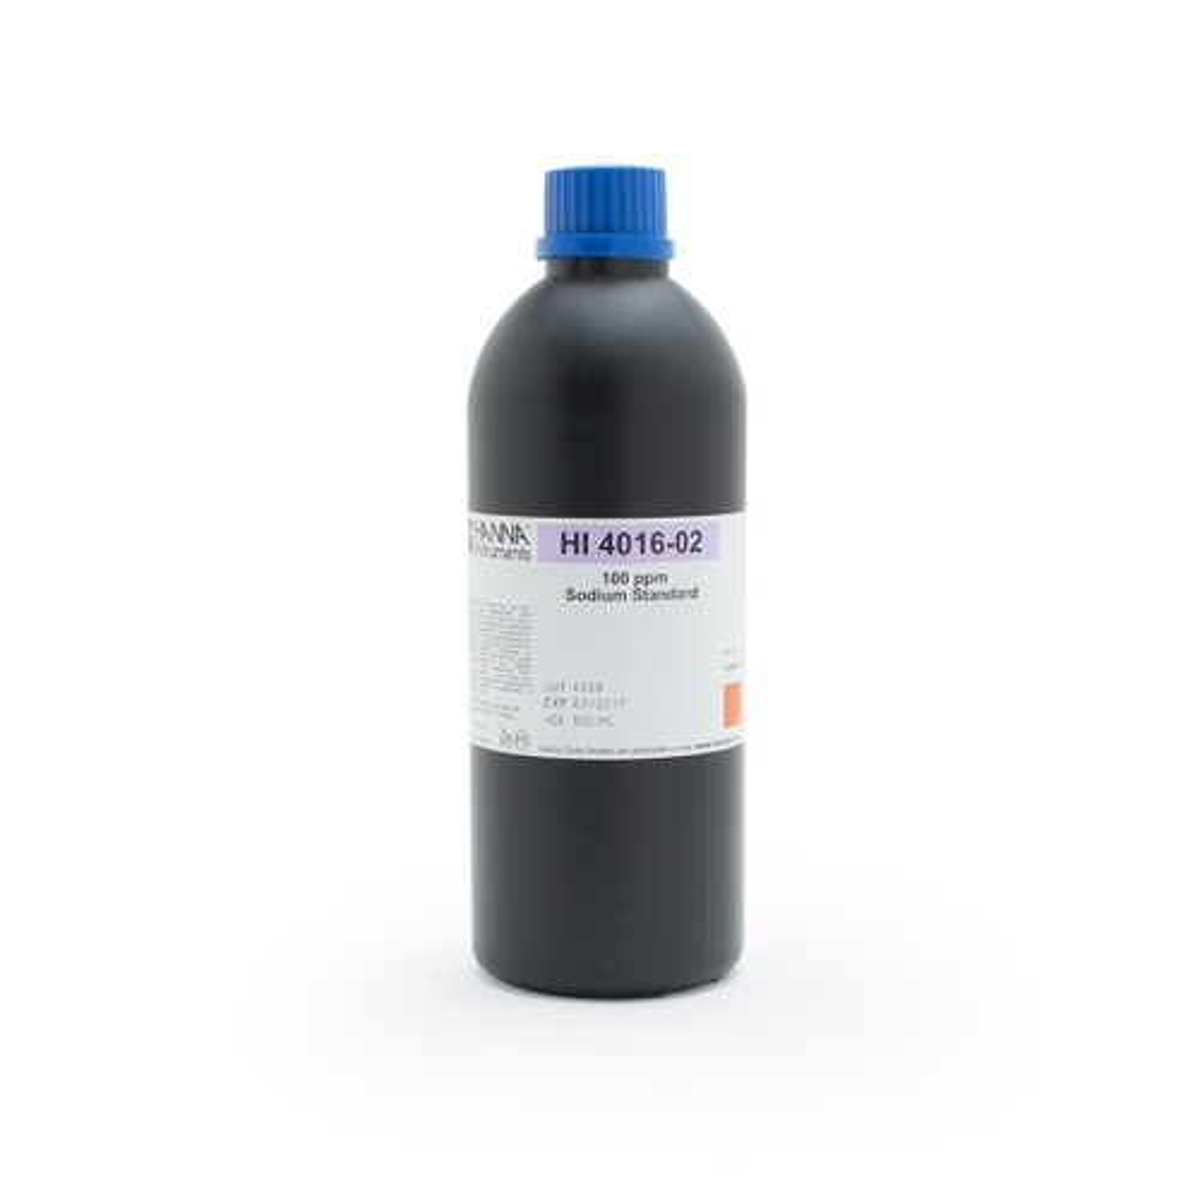 Sodium ISE 100 ppm Standard - HI4016-02